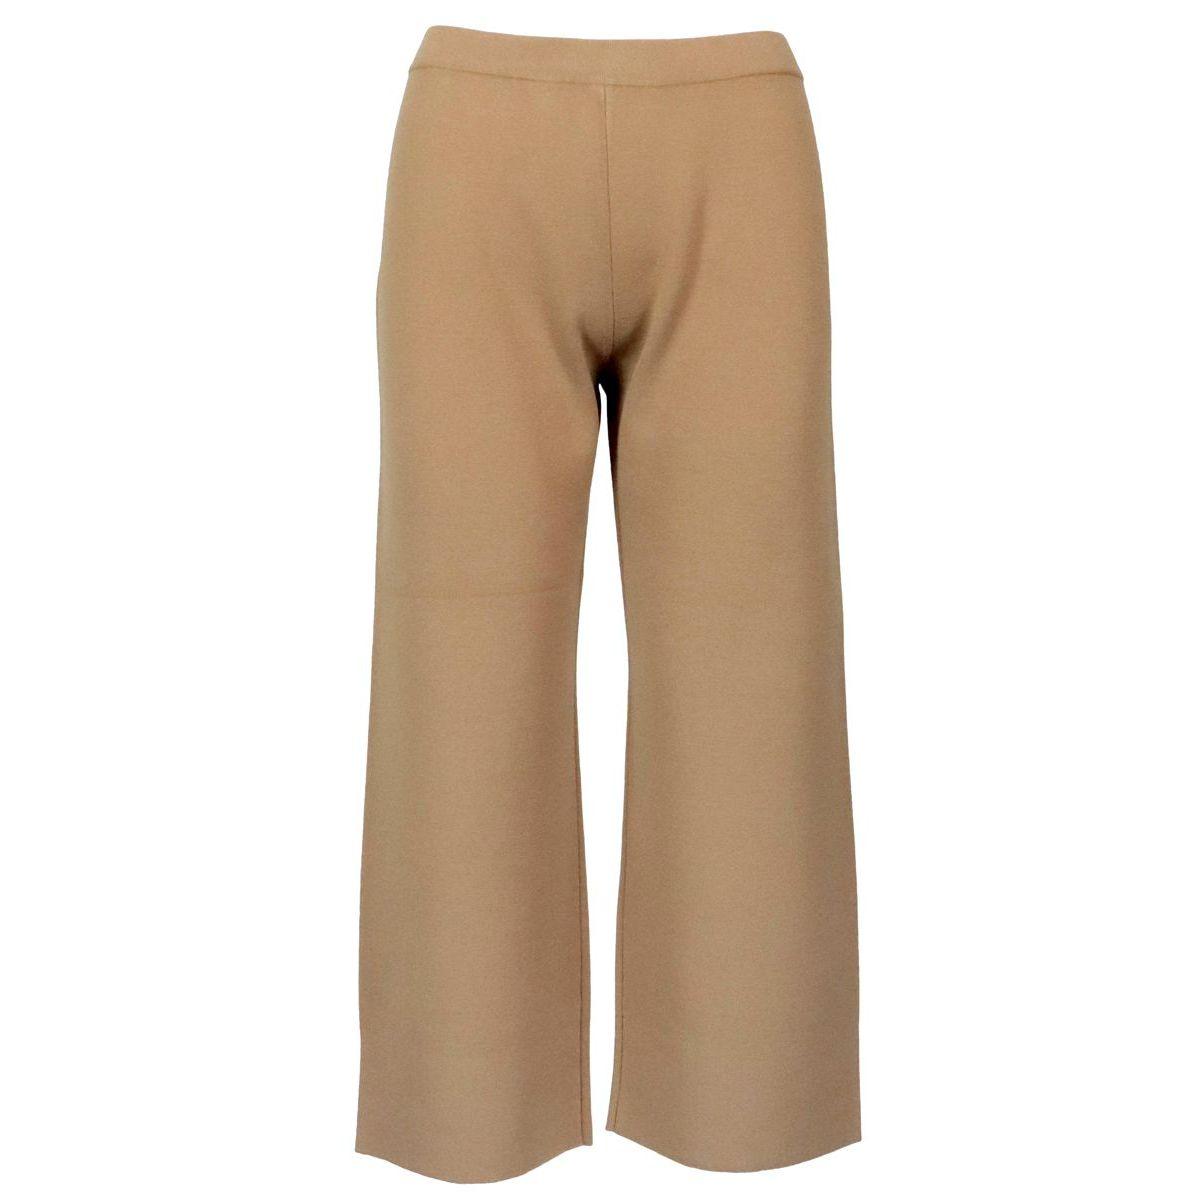 Fairy cropped trousers in viscose blend Camel MAX MARA STUDIO